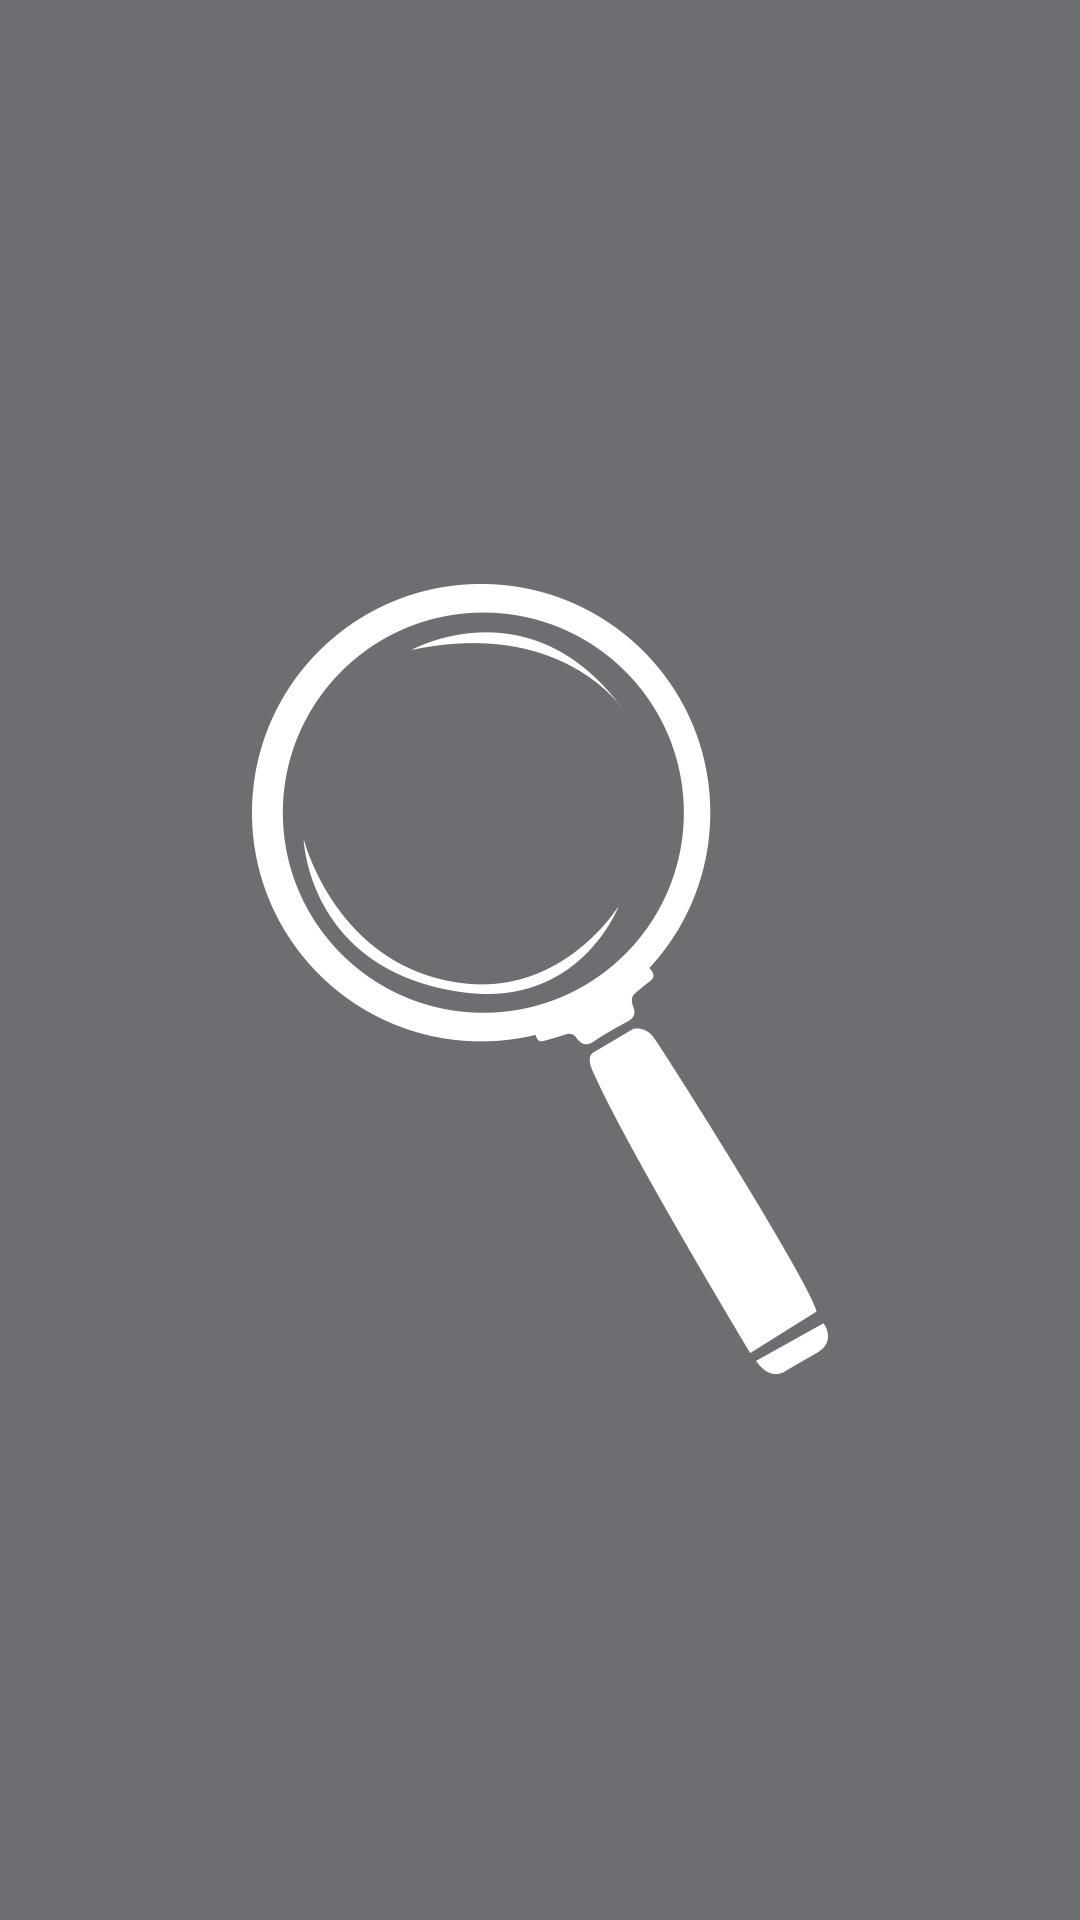 magnifying-glass.jpg